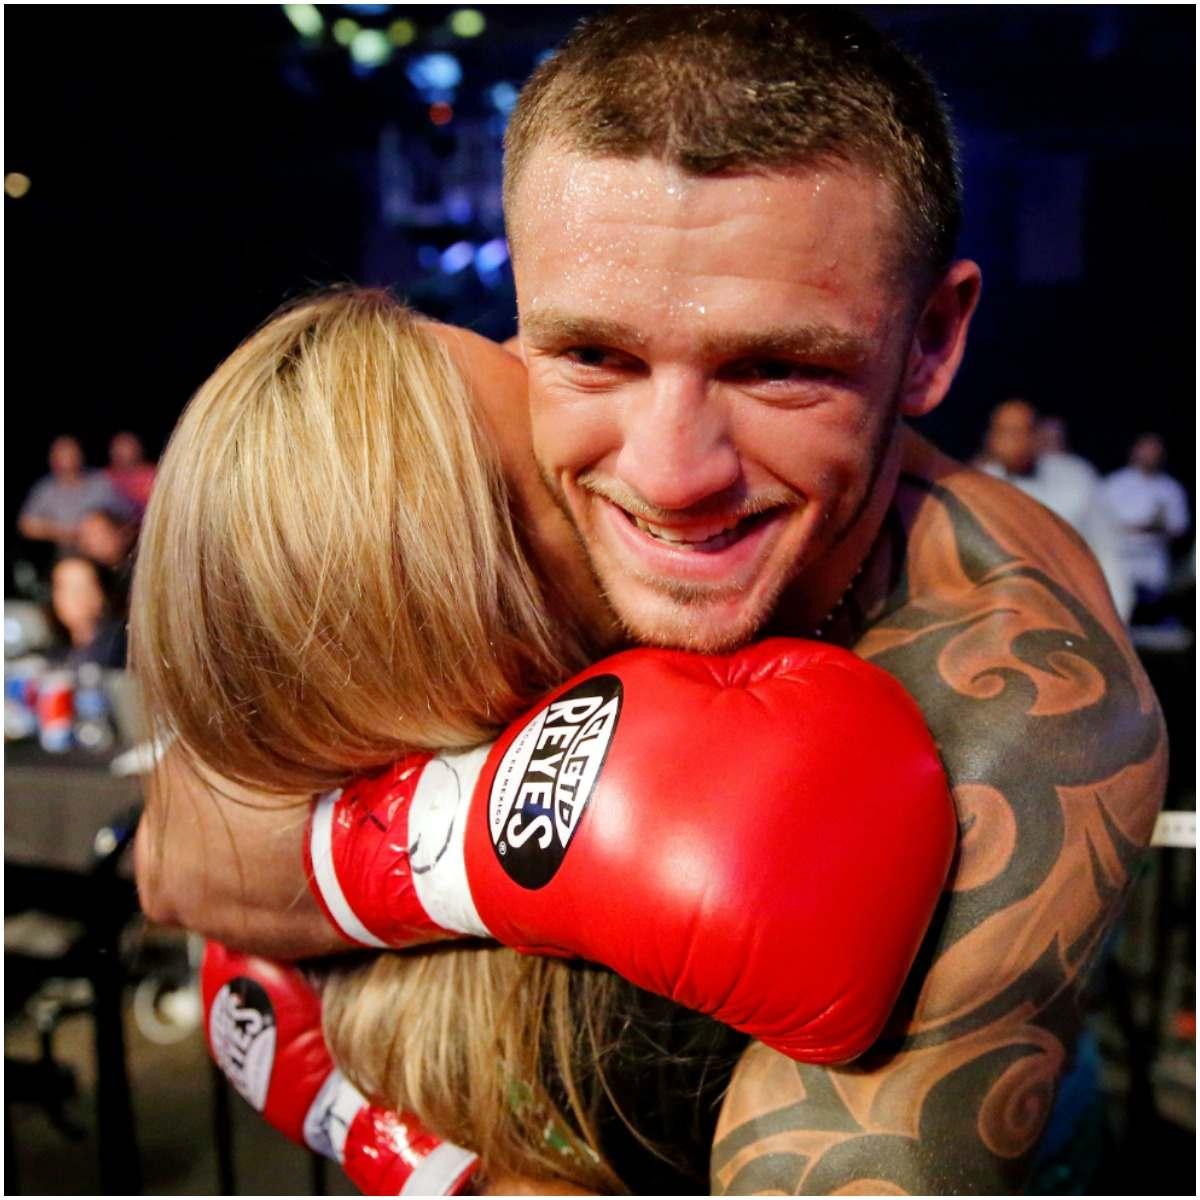 Joe Smith Jr. with his girlfriend Kelly Reilly